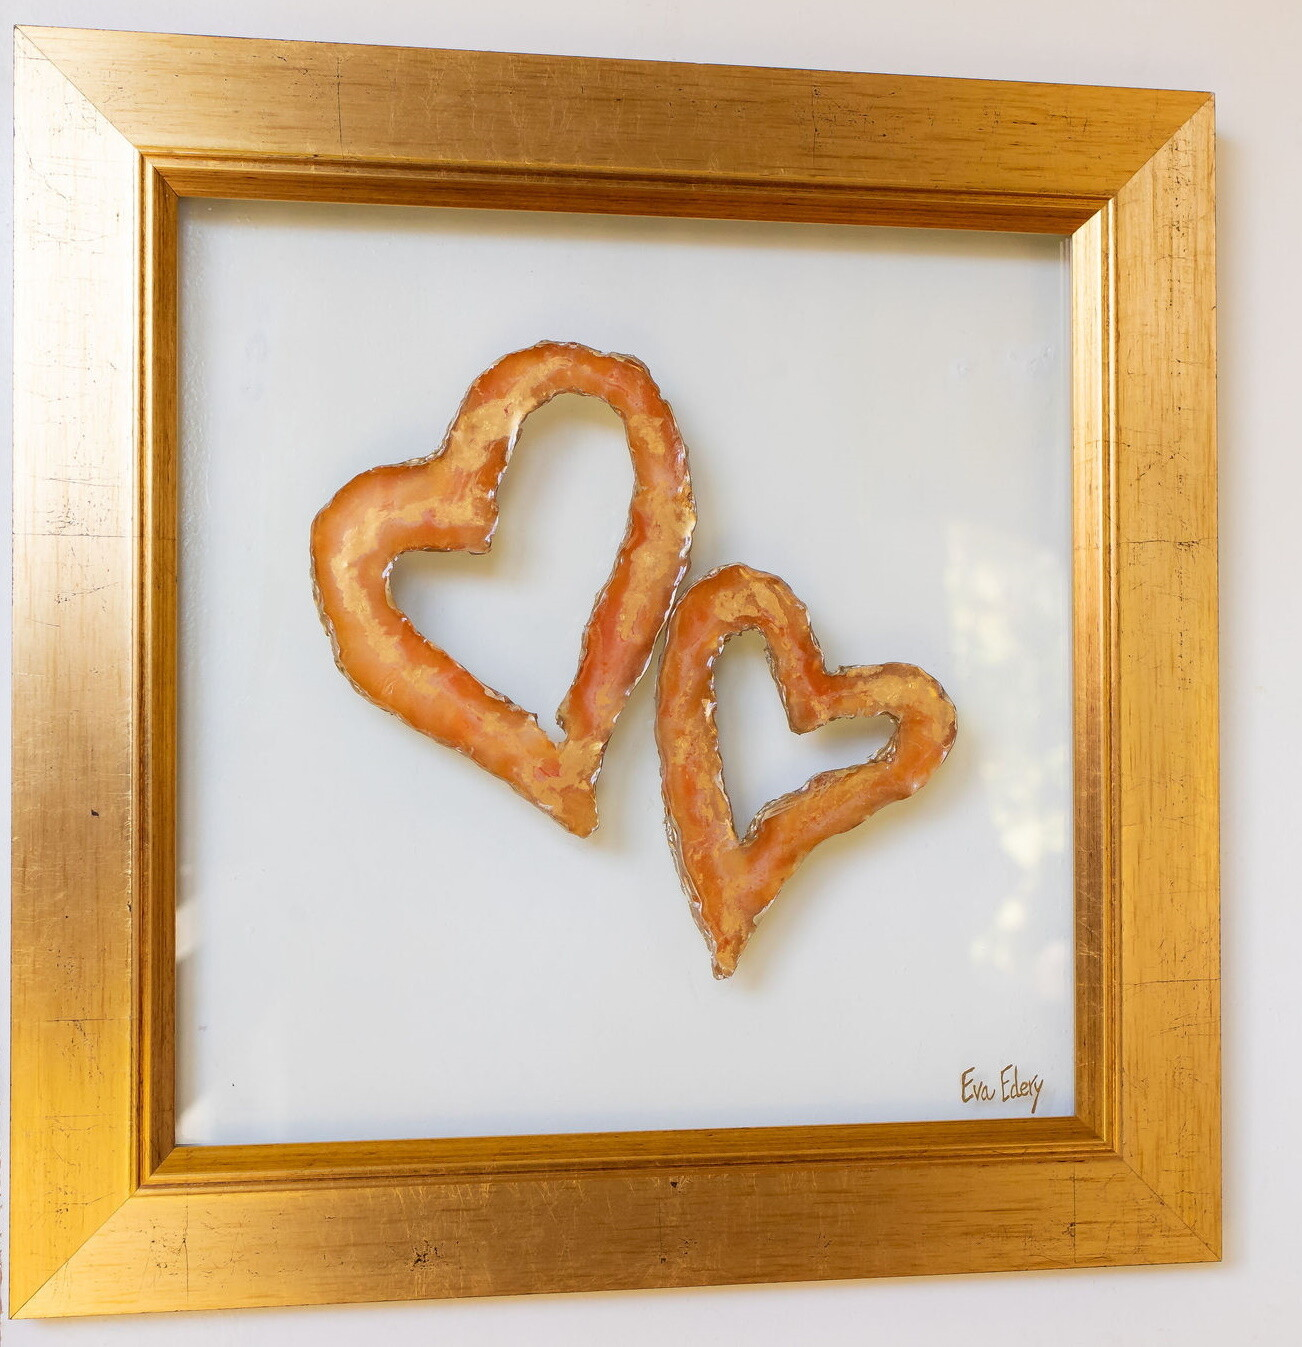 Heart Pair in Golden Hues